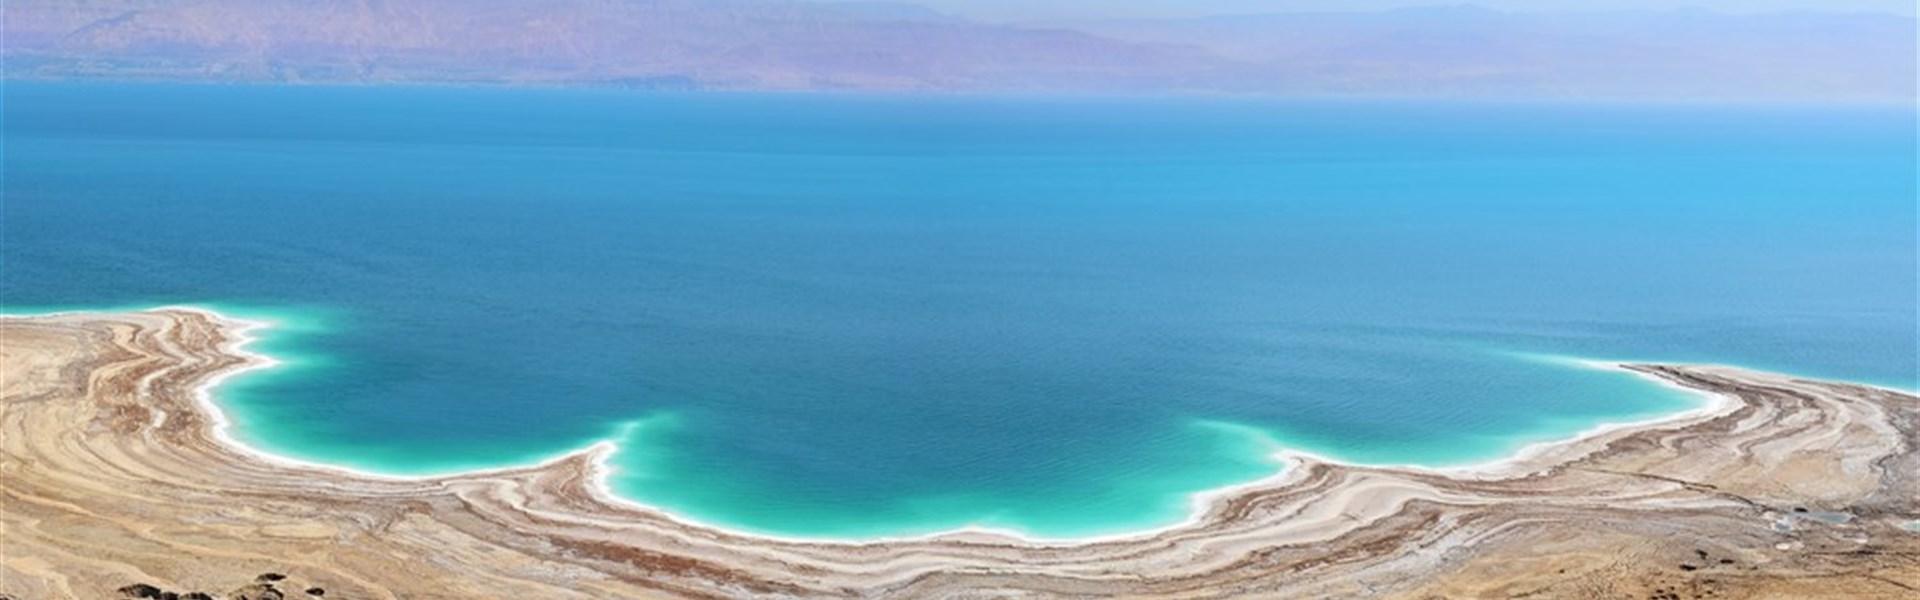 Okruh - Petra, Wadi Rum, Mrtvé moře - Mrtvé moře